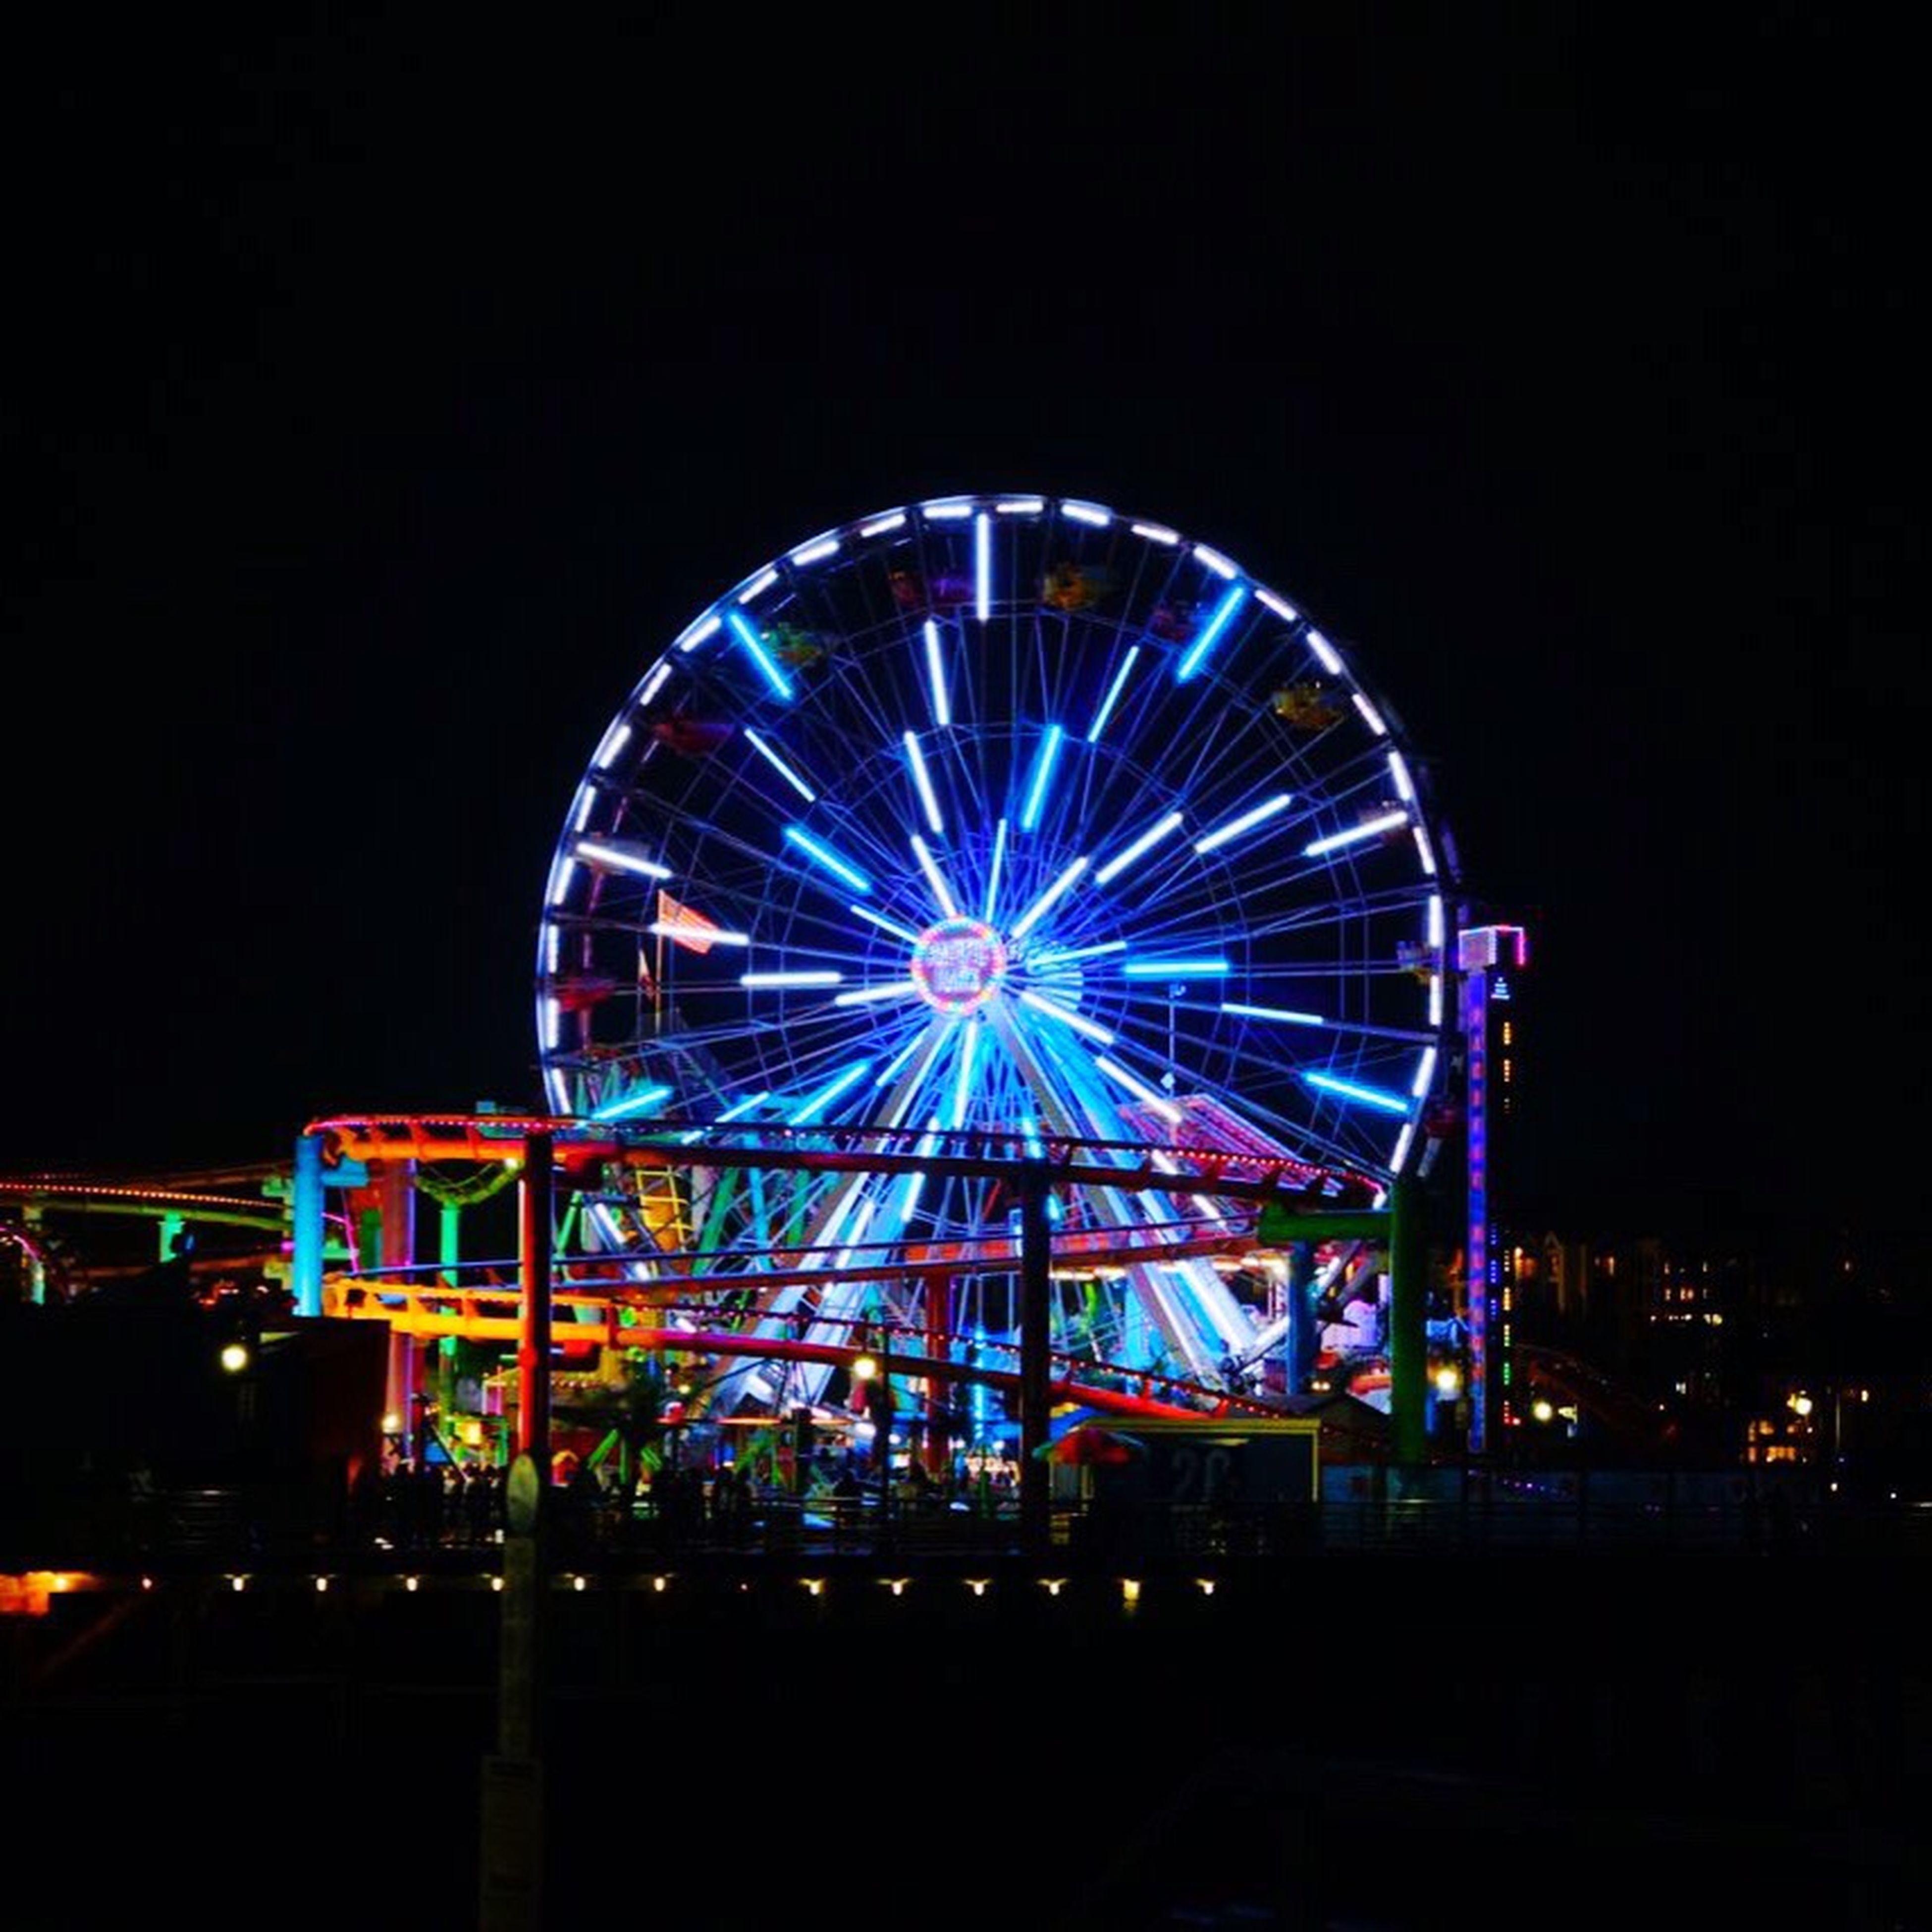 Night Amusement Park Outdoors